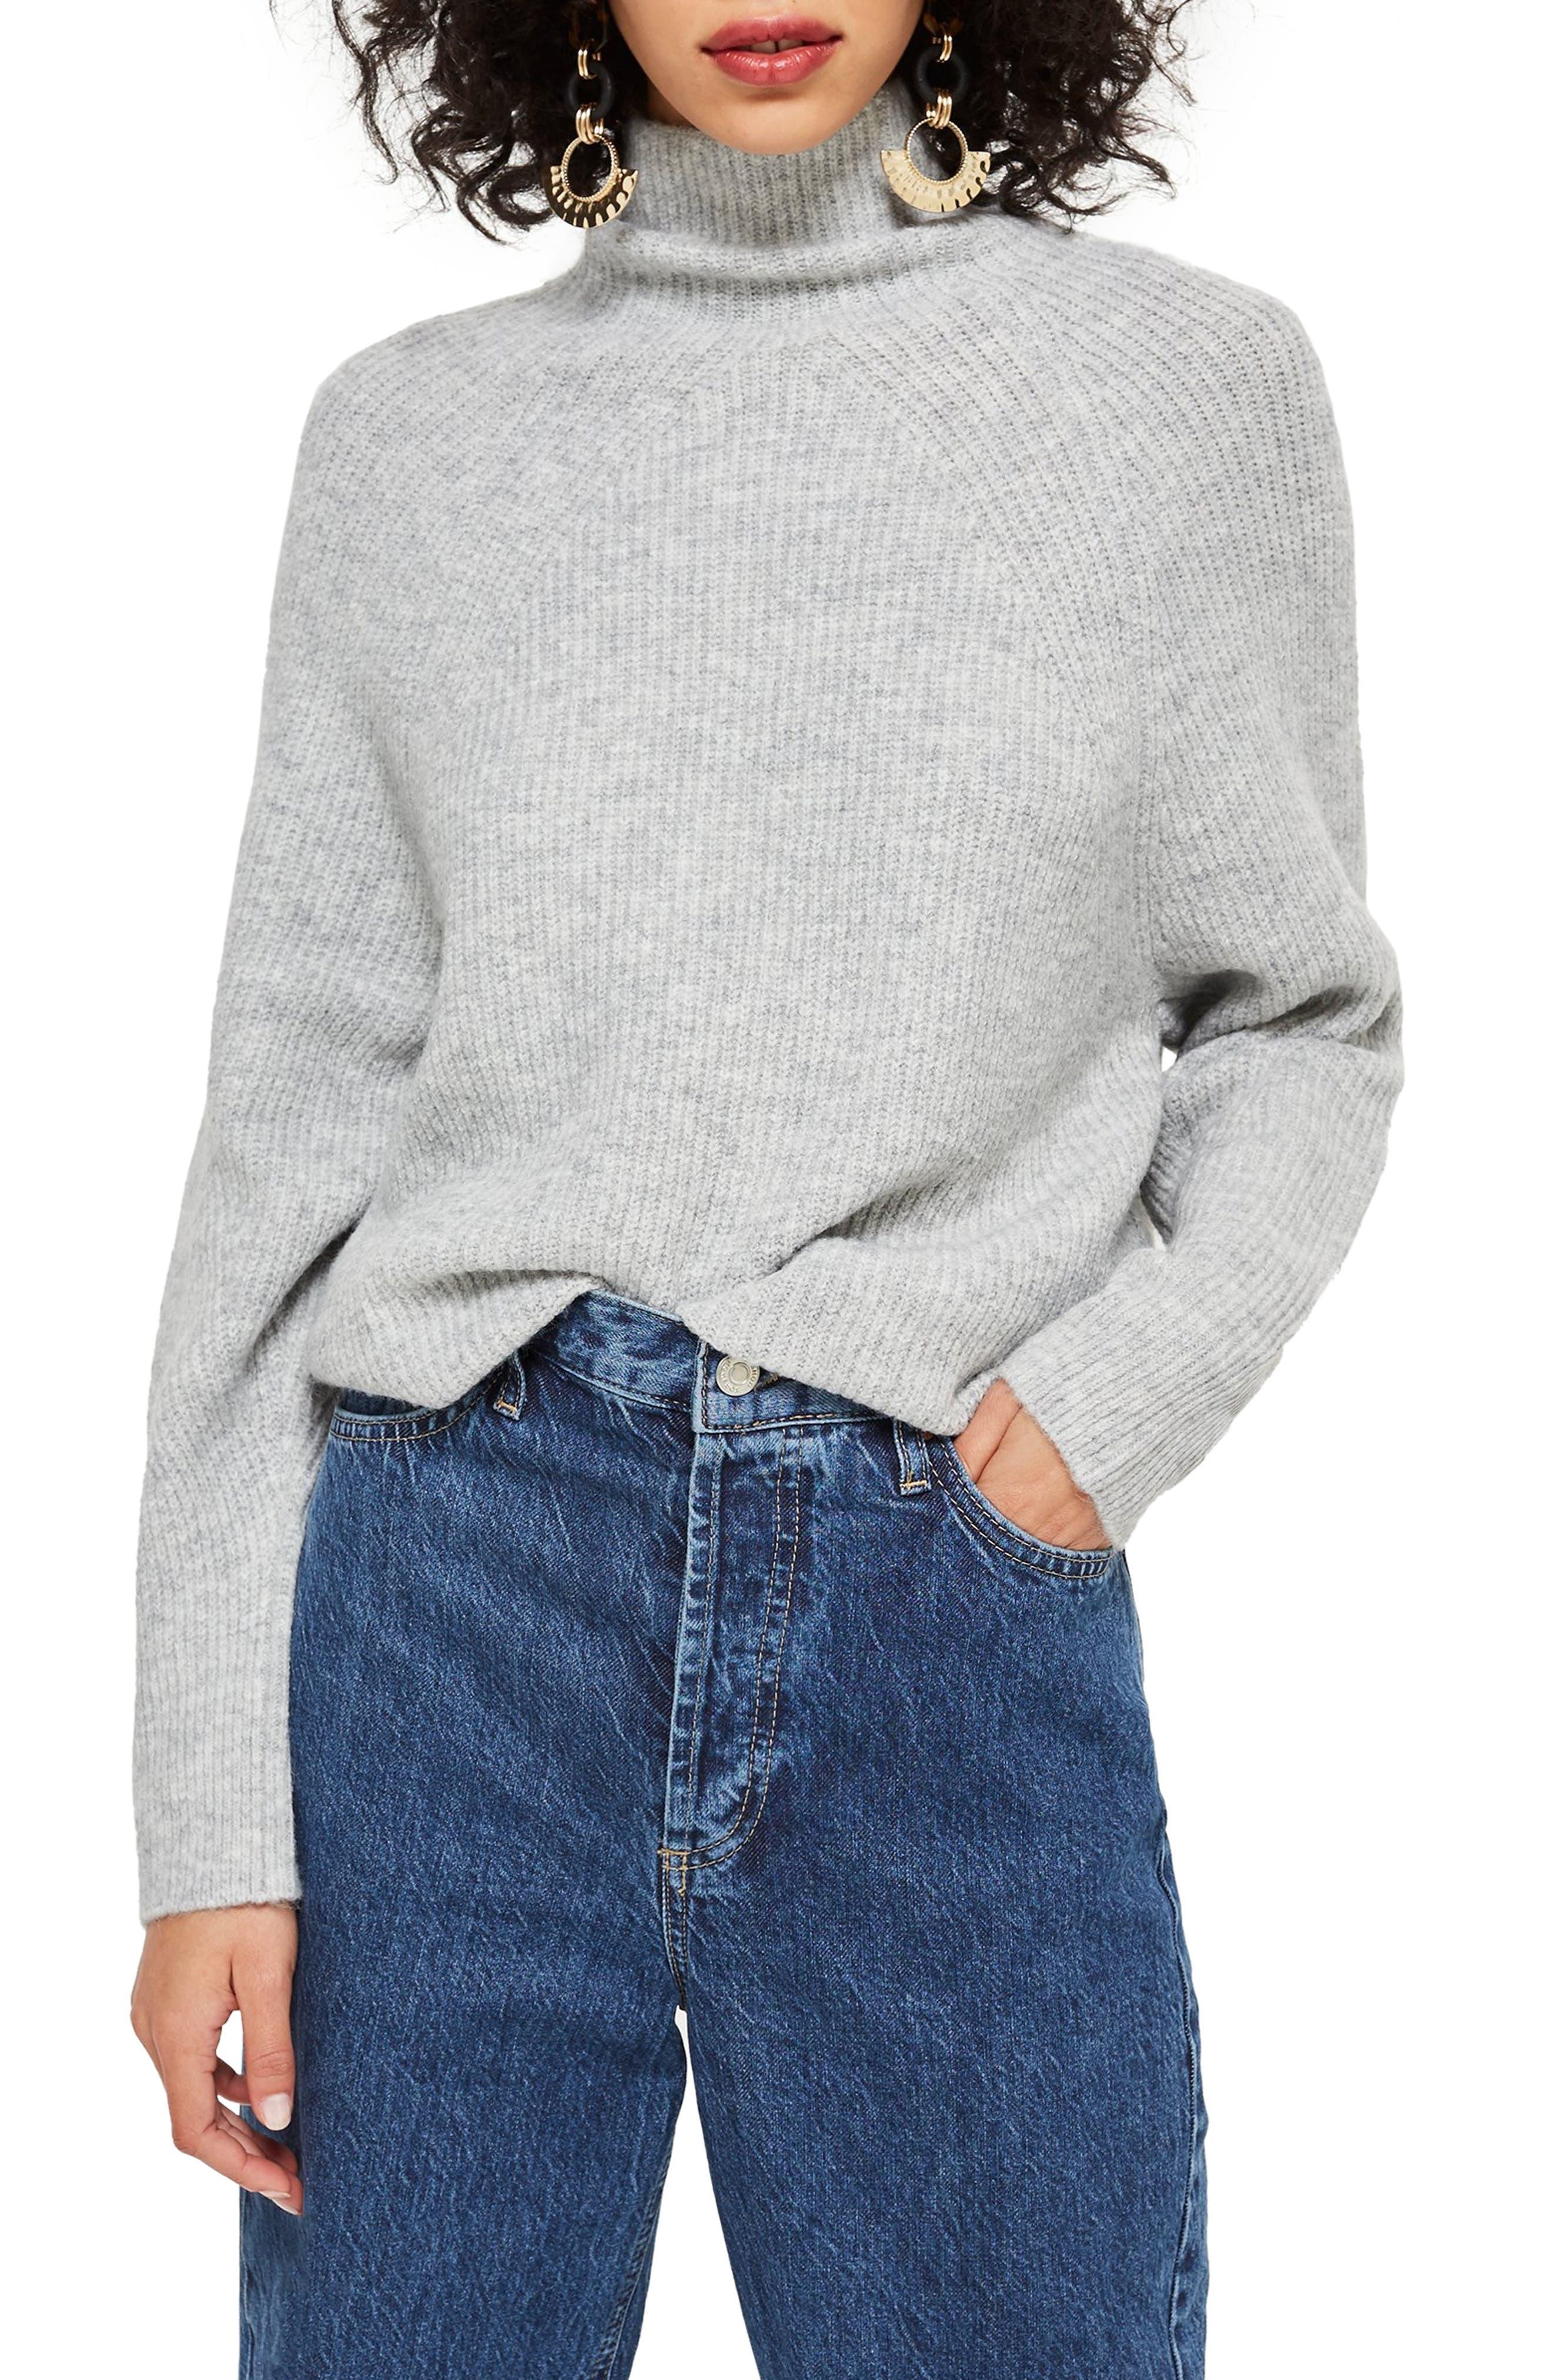 TOPSHOP Raglan Turtleneck Neck Sweater, Main, color, GREY MARL